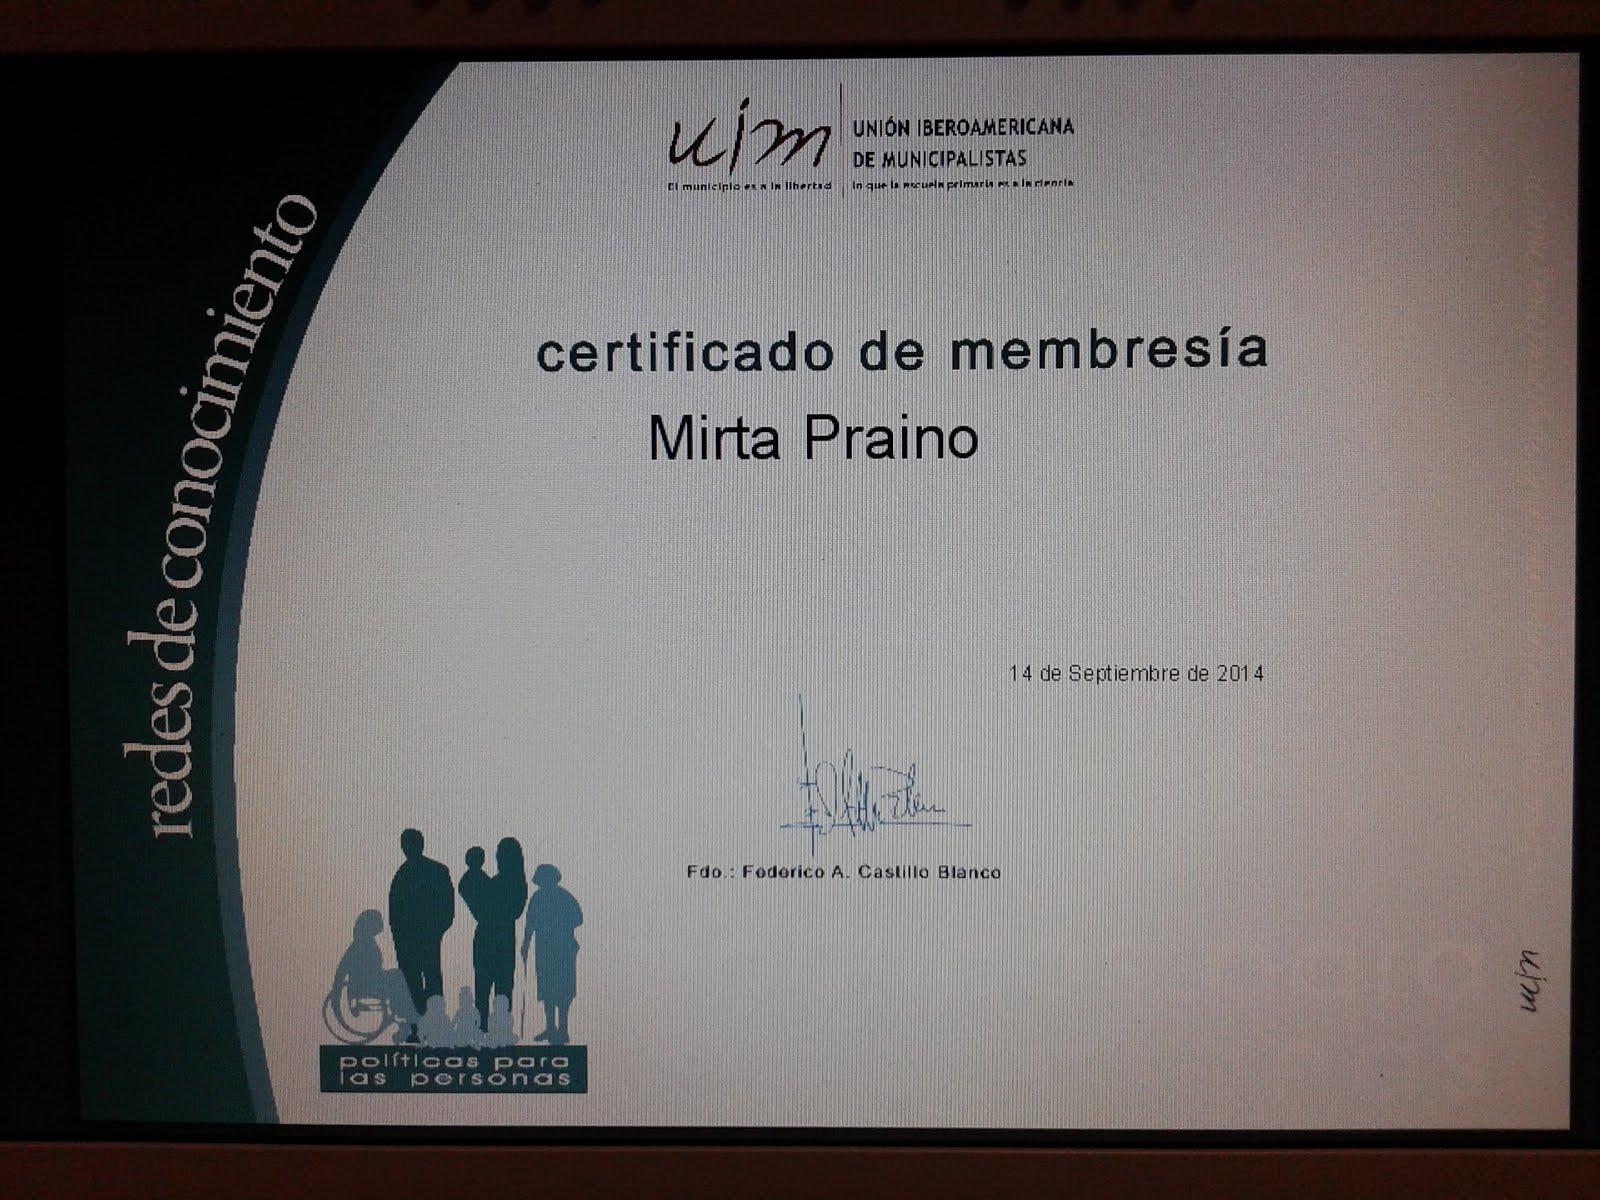 Certificado de Membresia